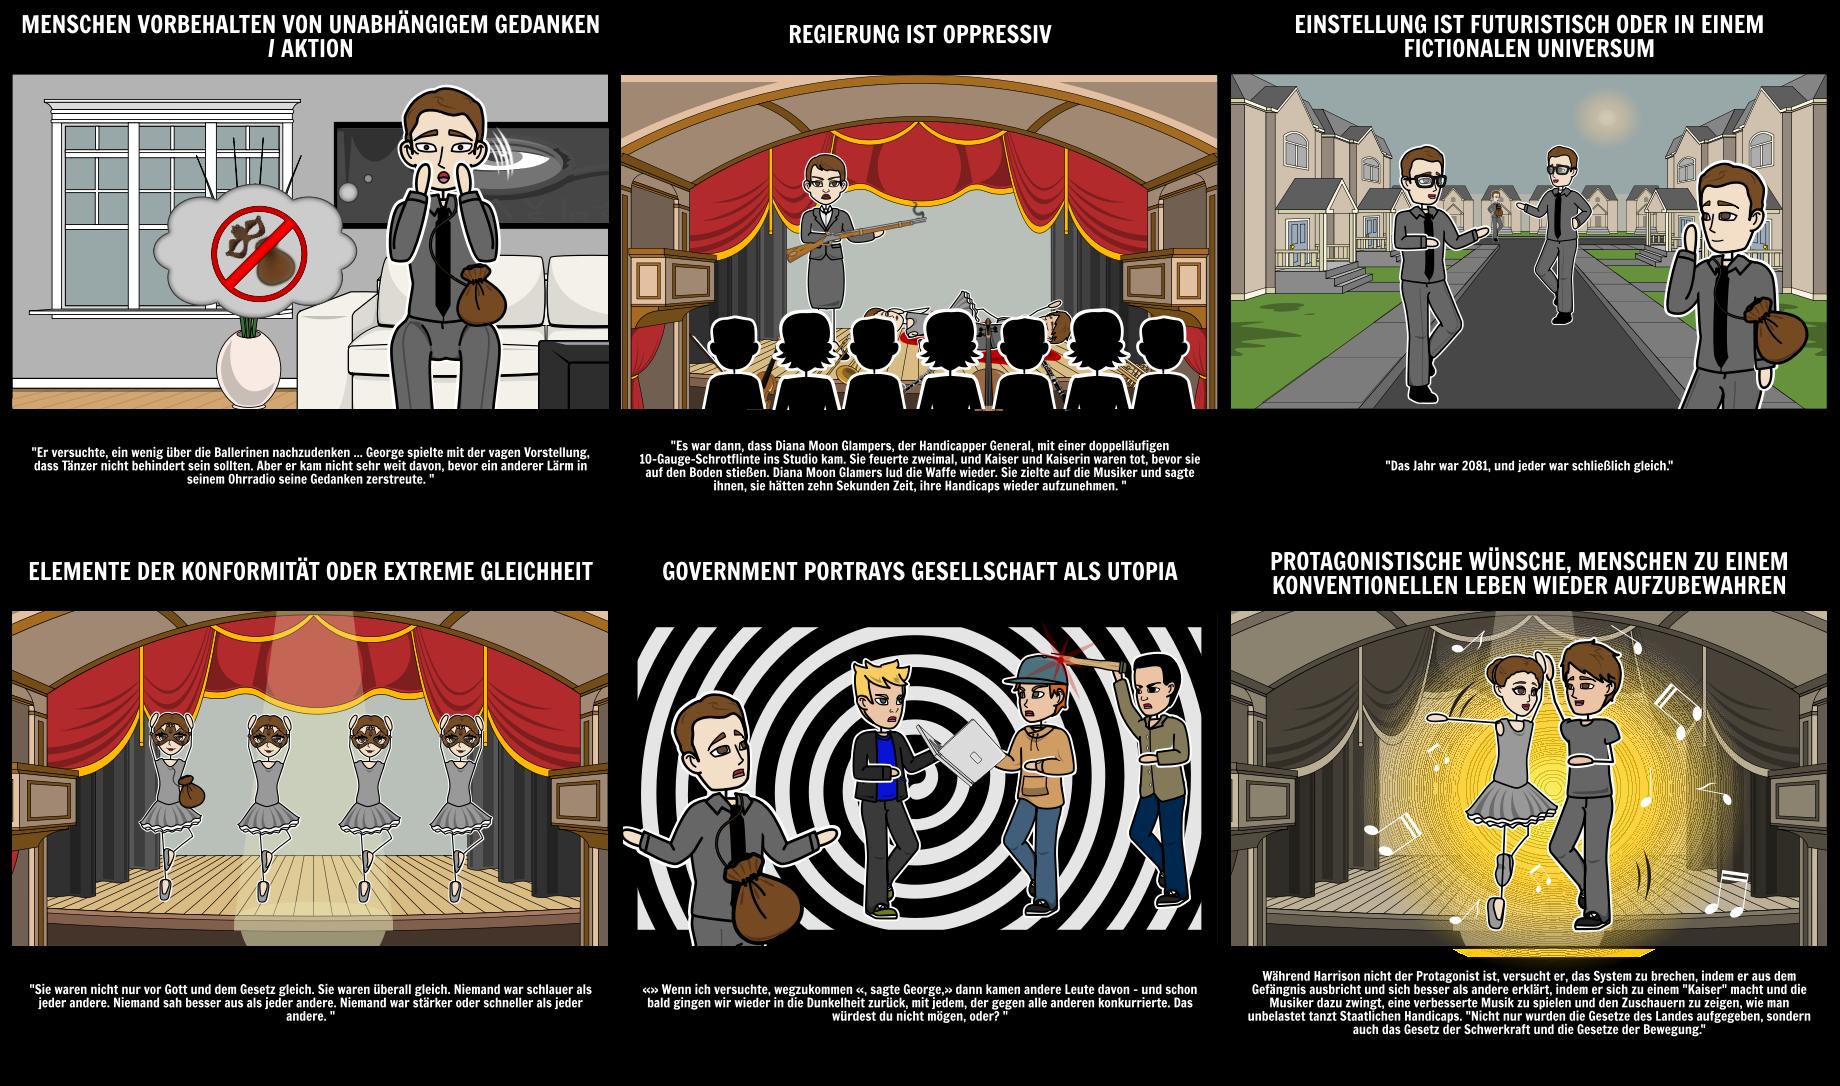 Dystopische Elemente in Harrison Bergeron